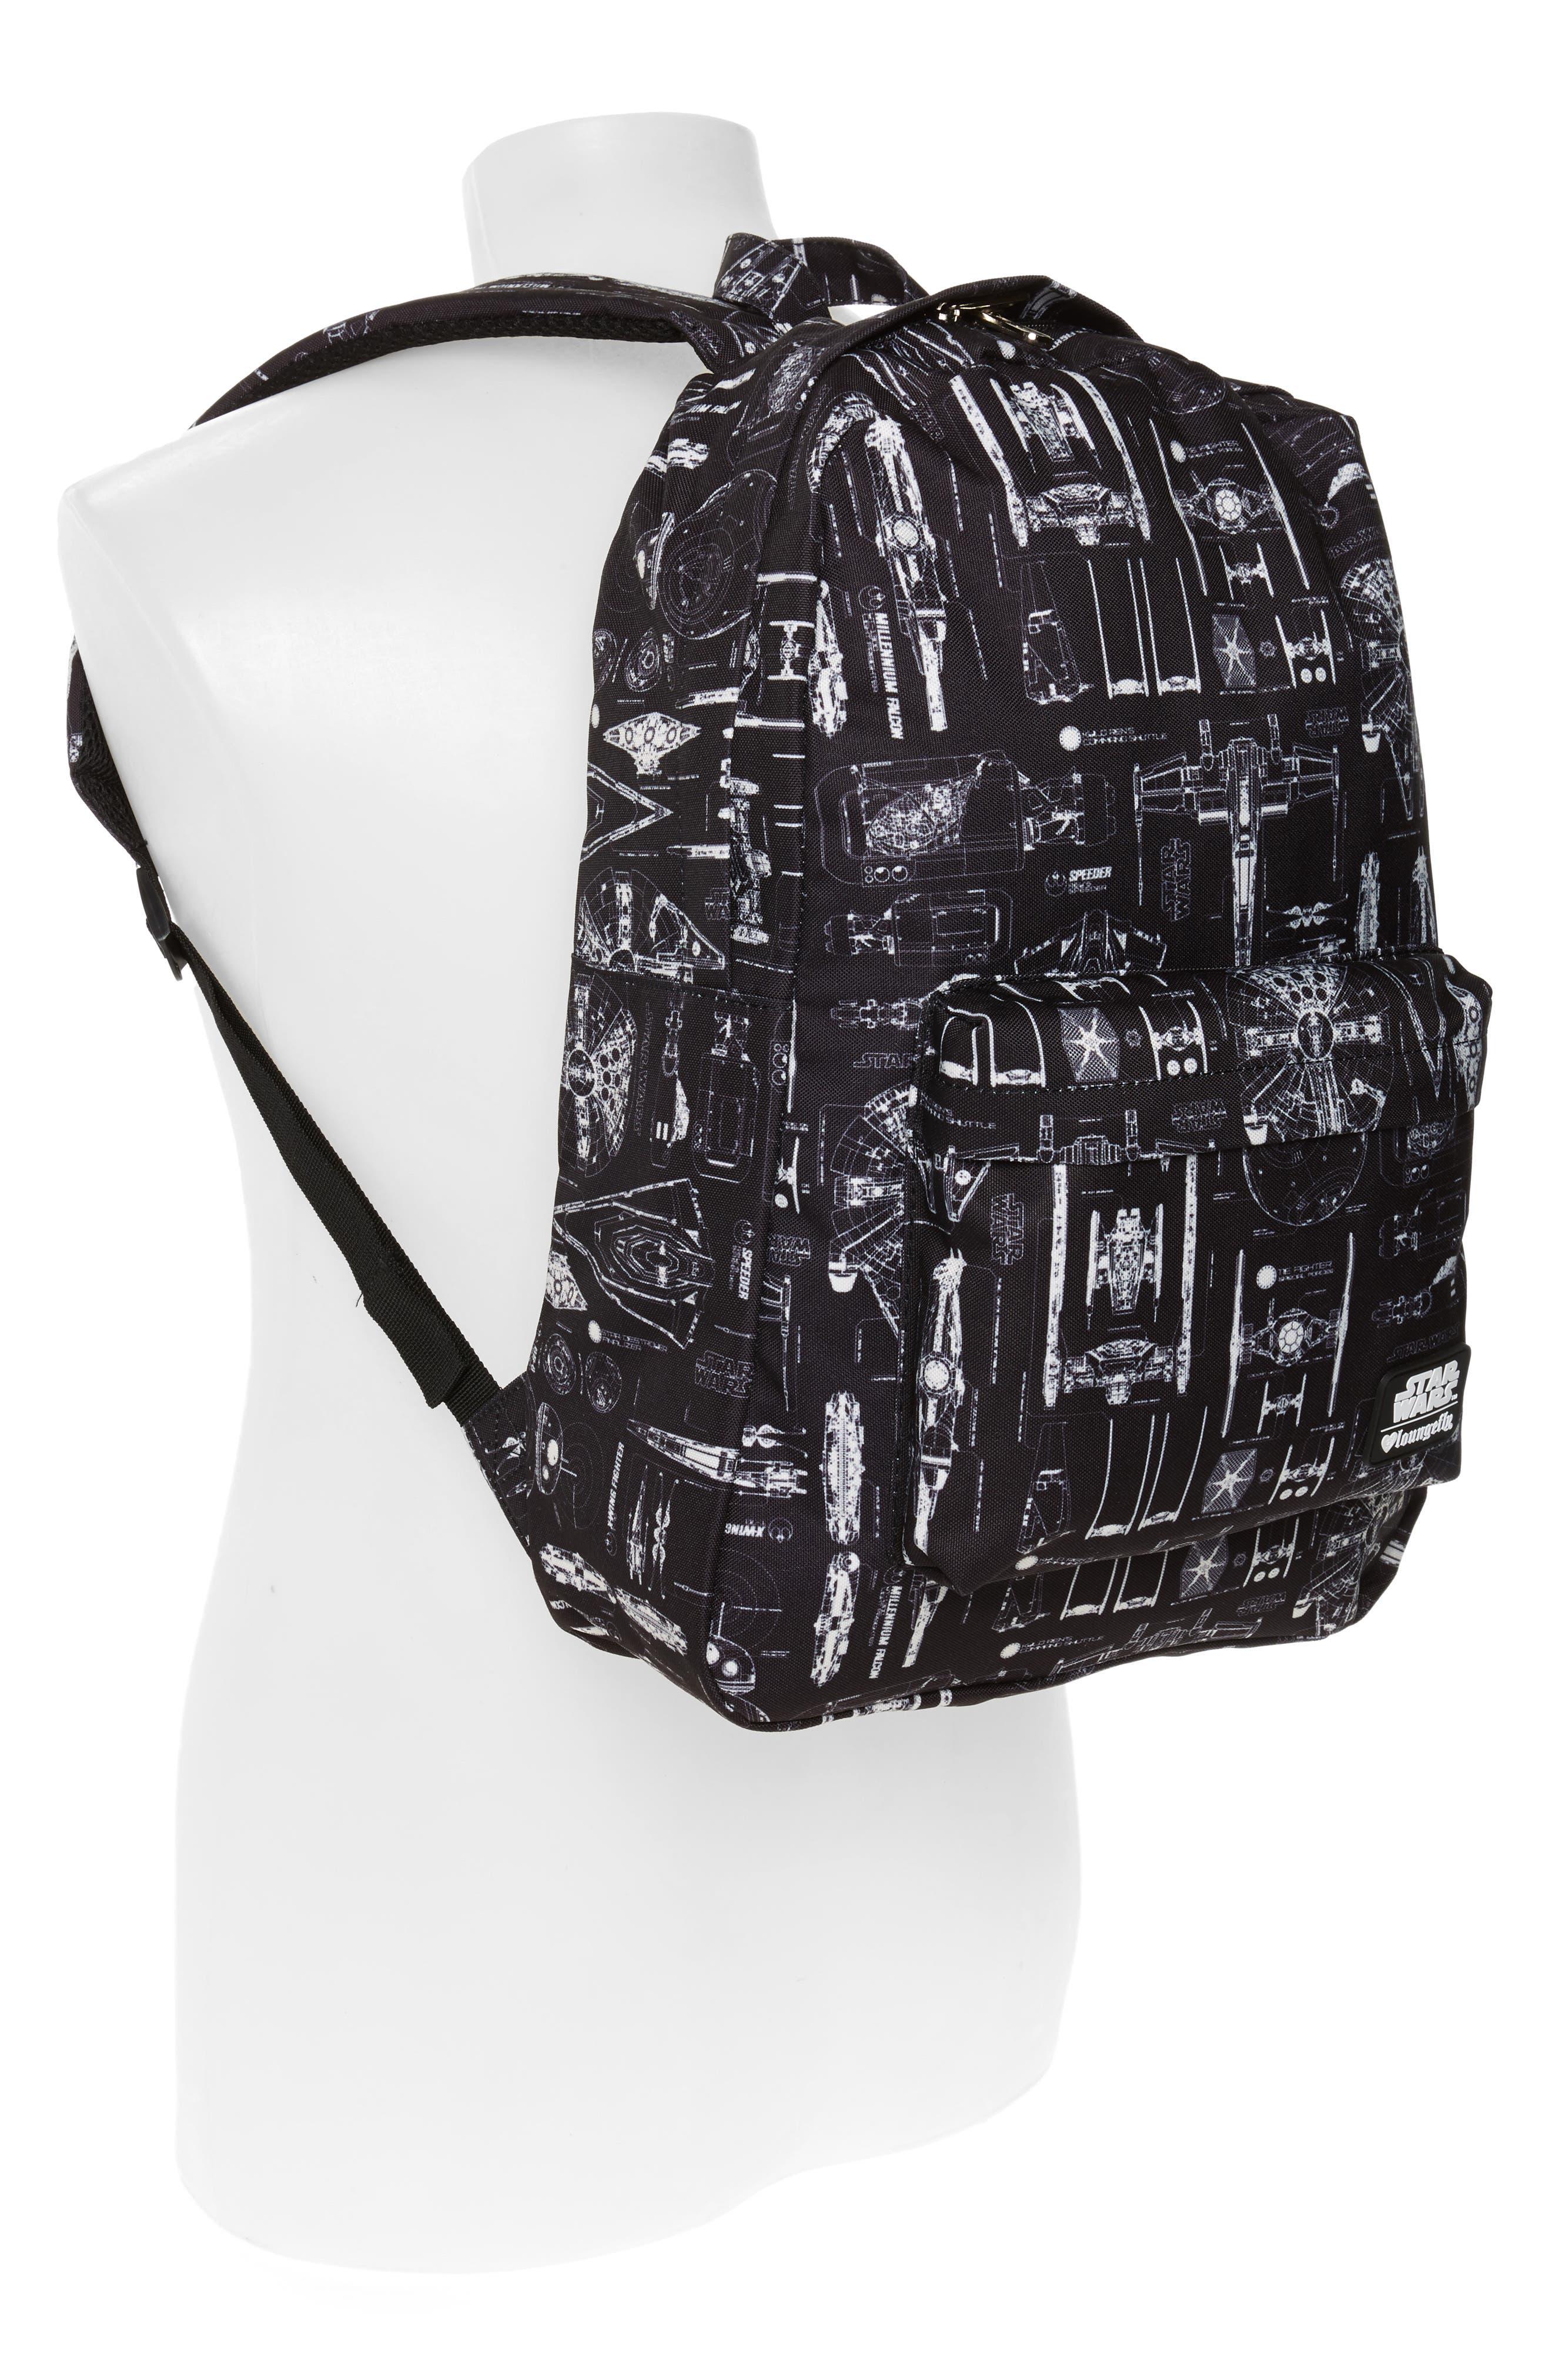 Star Wars<sup>™</sup> The Force Awakens Blueprint Backpack,                             Alternate thumbnail 6, color,                             Black